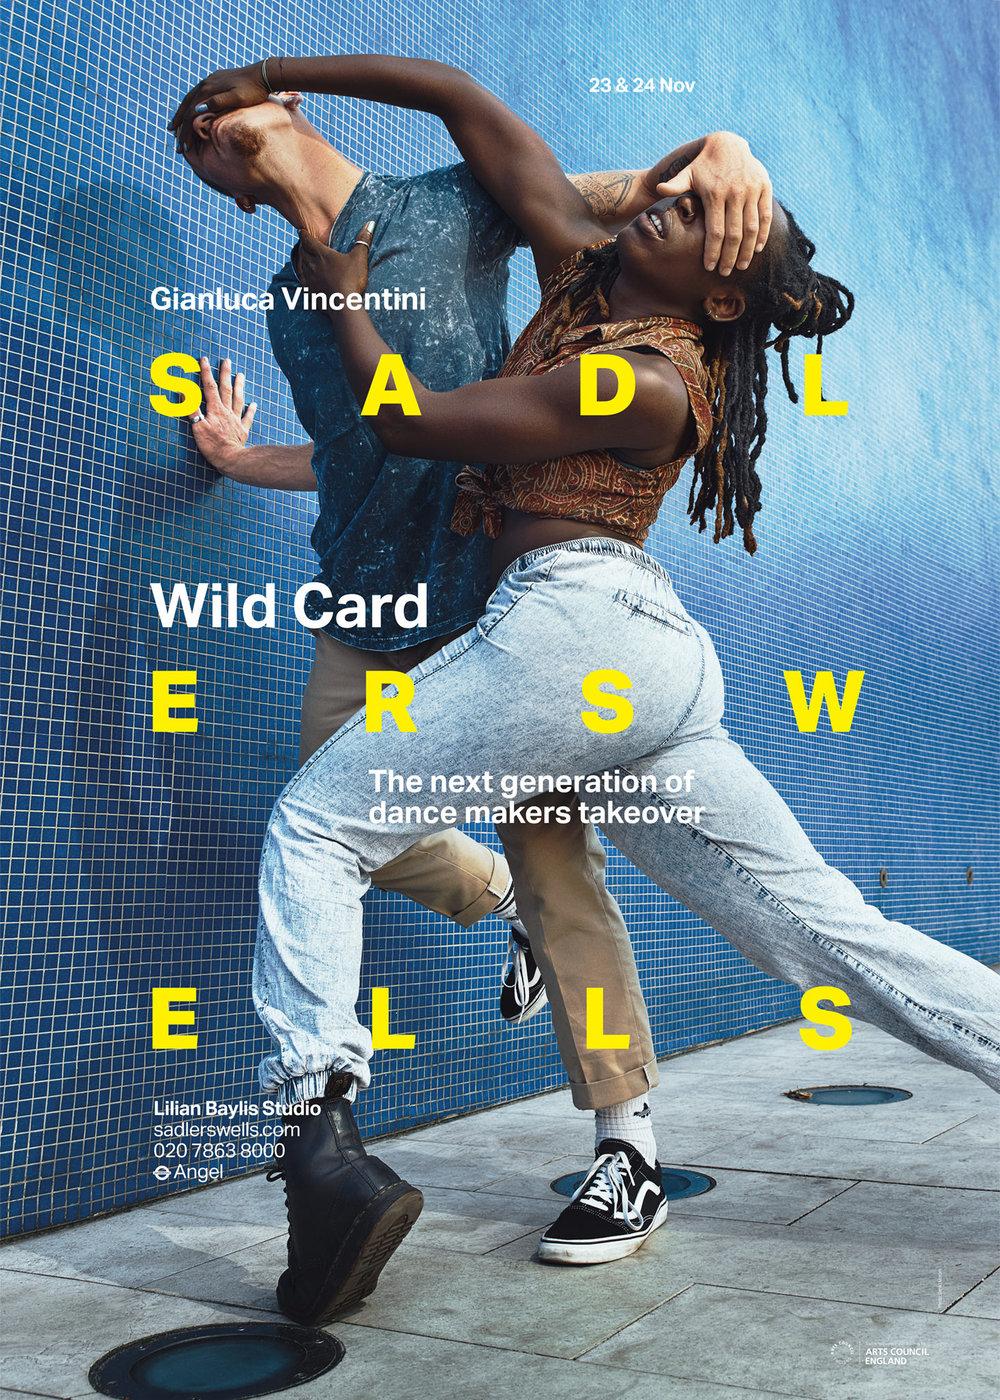 SADLER'S WELLS - WILD CARD